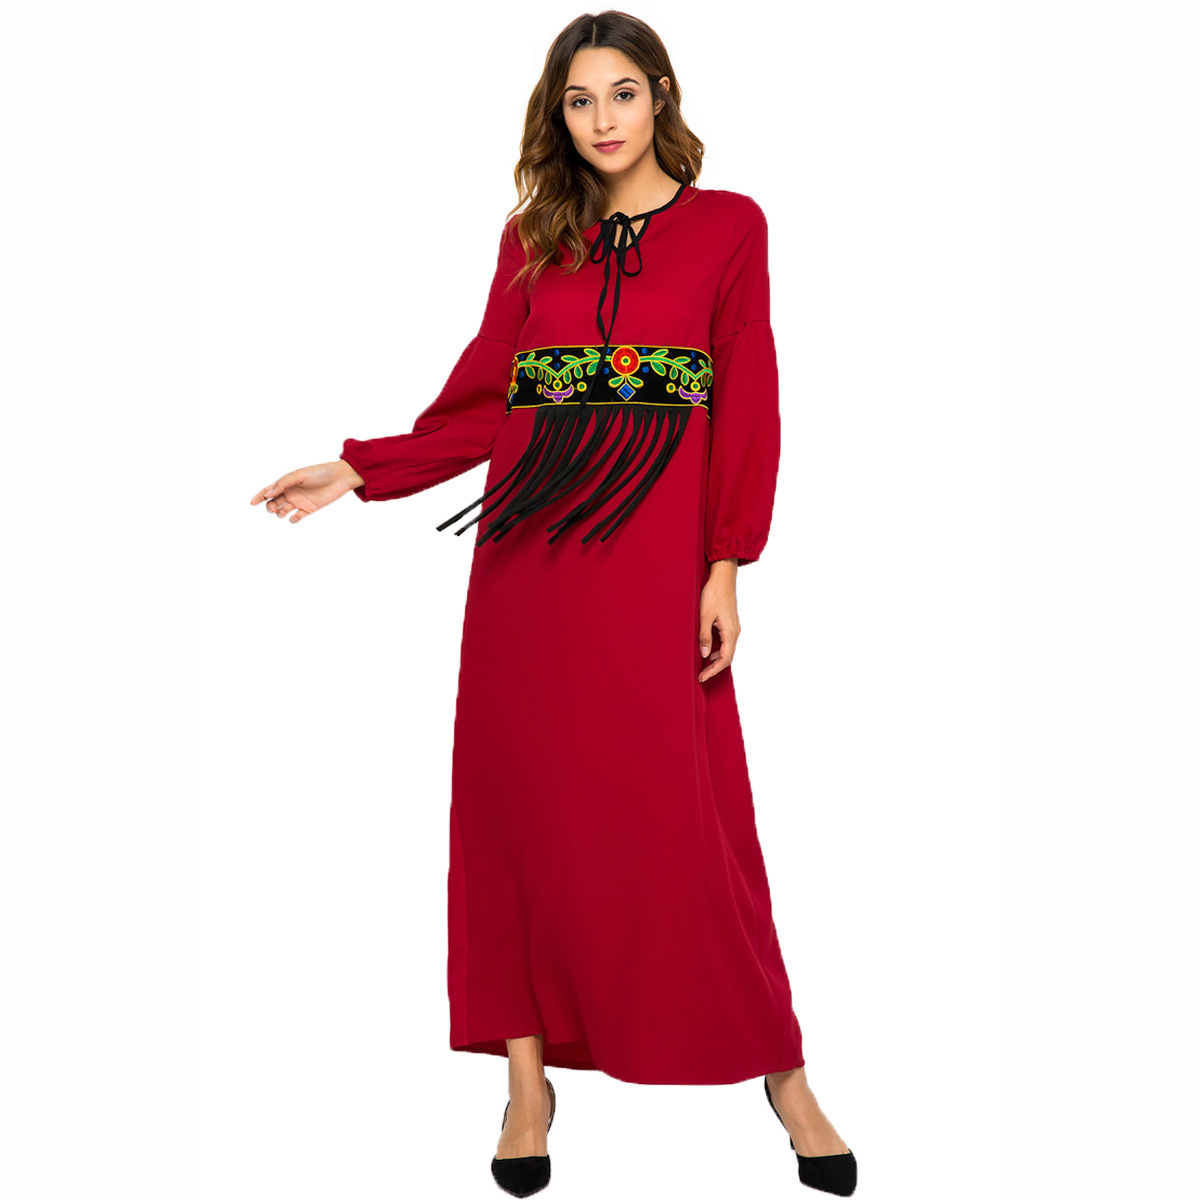 a824d501614f5 Fashion Muslim Women Embroidered Tassel Long Sleeve Dress Abaya Islamic  Middle East Jubah Ramadan Turkish Arabic